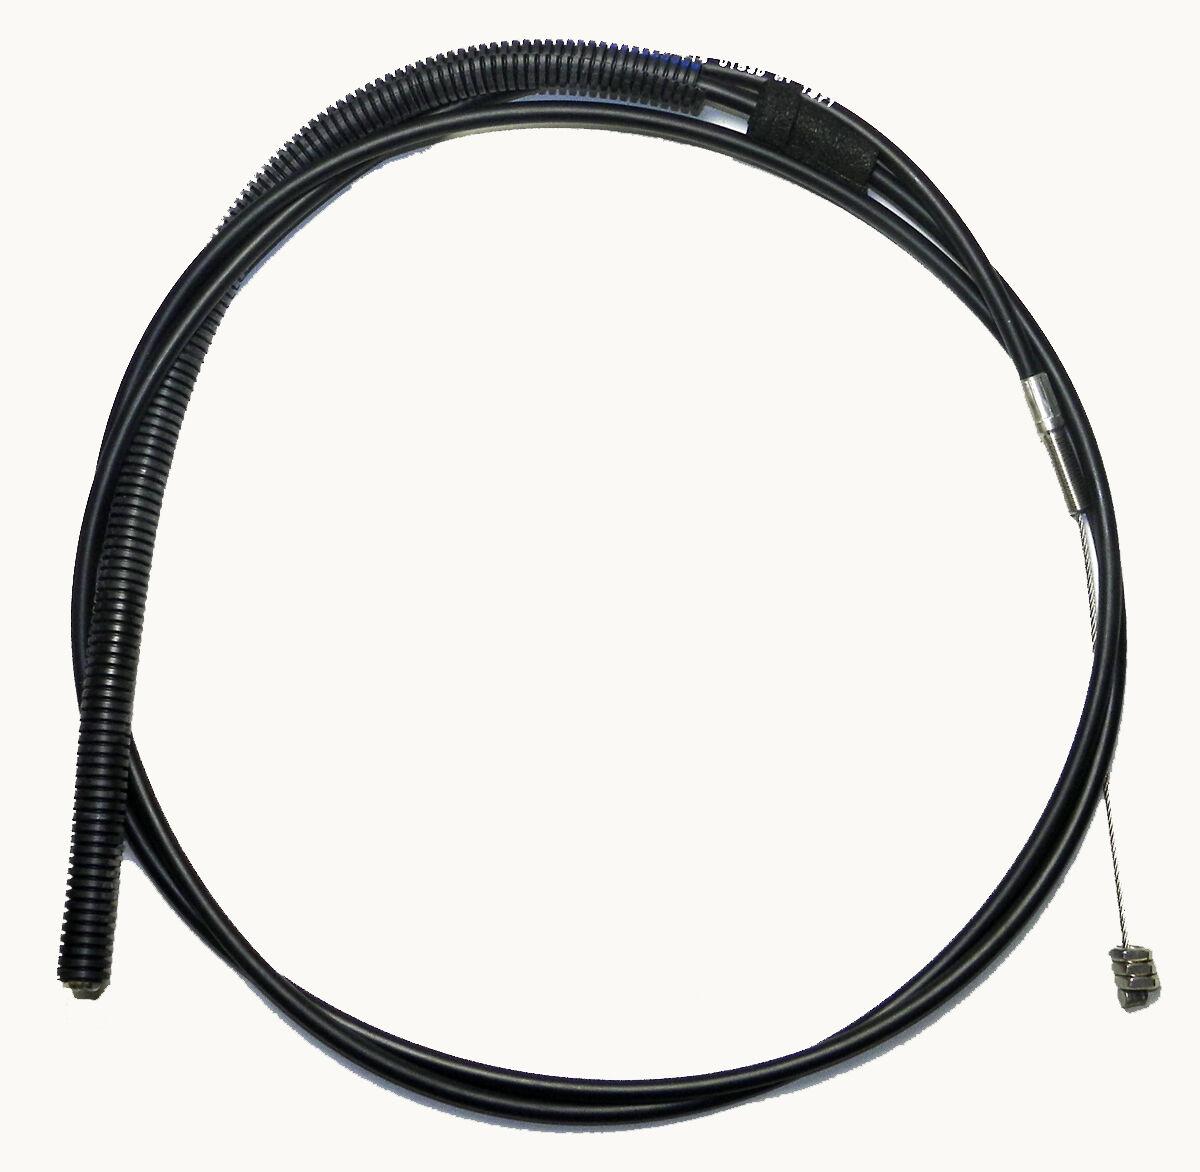 Trim Cable Upper Yamaha 1000/1100 PWC F1B-U153D-00-00/F1B-U153D-01-00 002-052-04